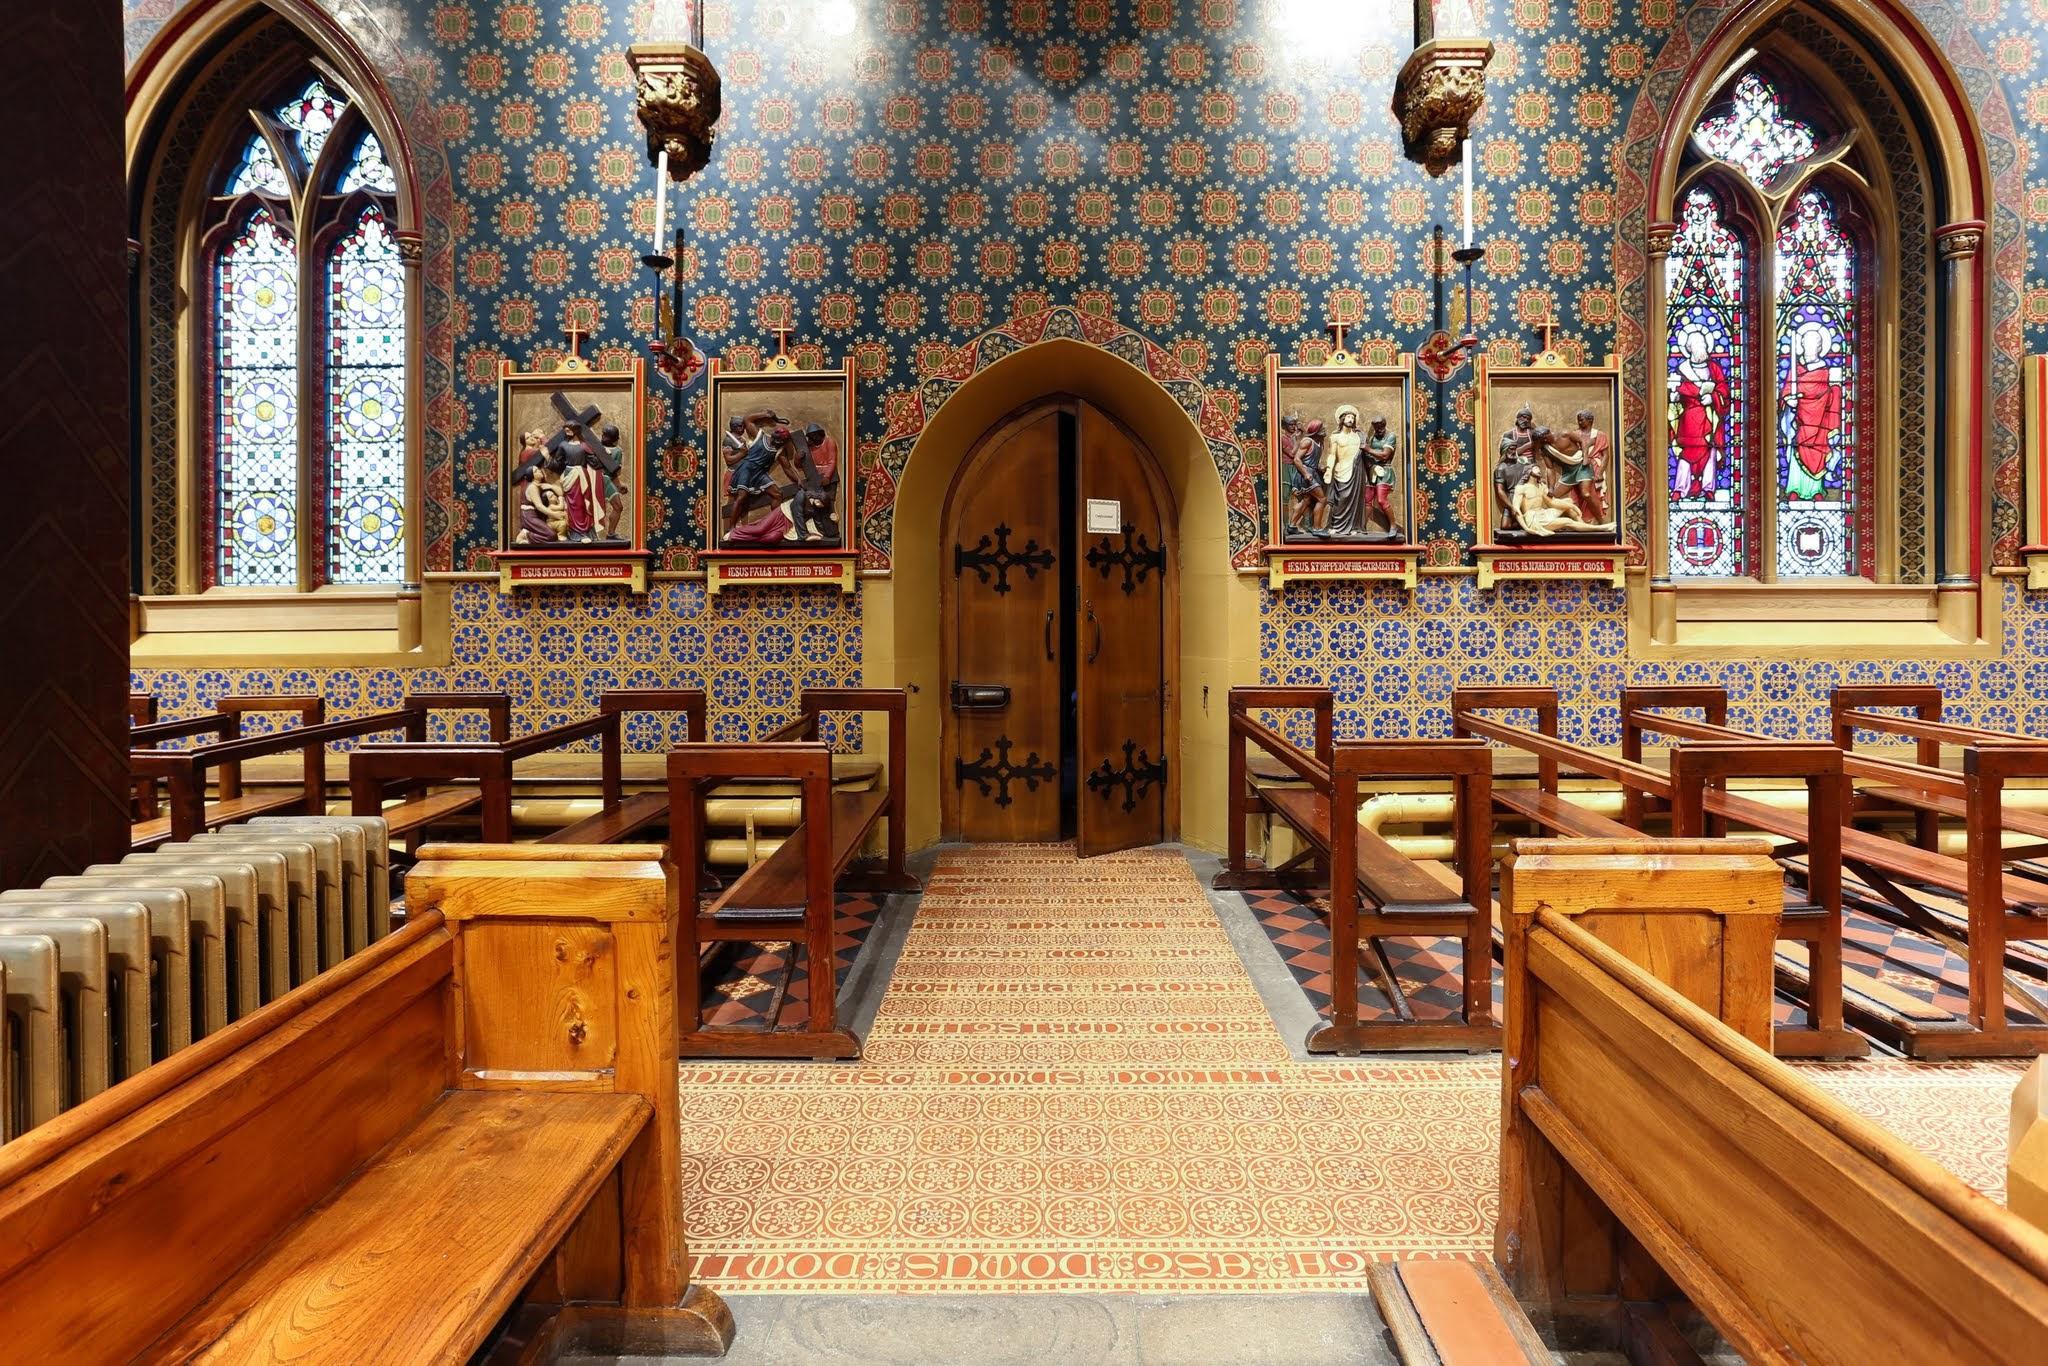 St Giles R. C. Church, Cheadle, Staffordshire - Tiles u0026 Architectural Ceramics Society (TACS)